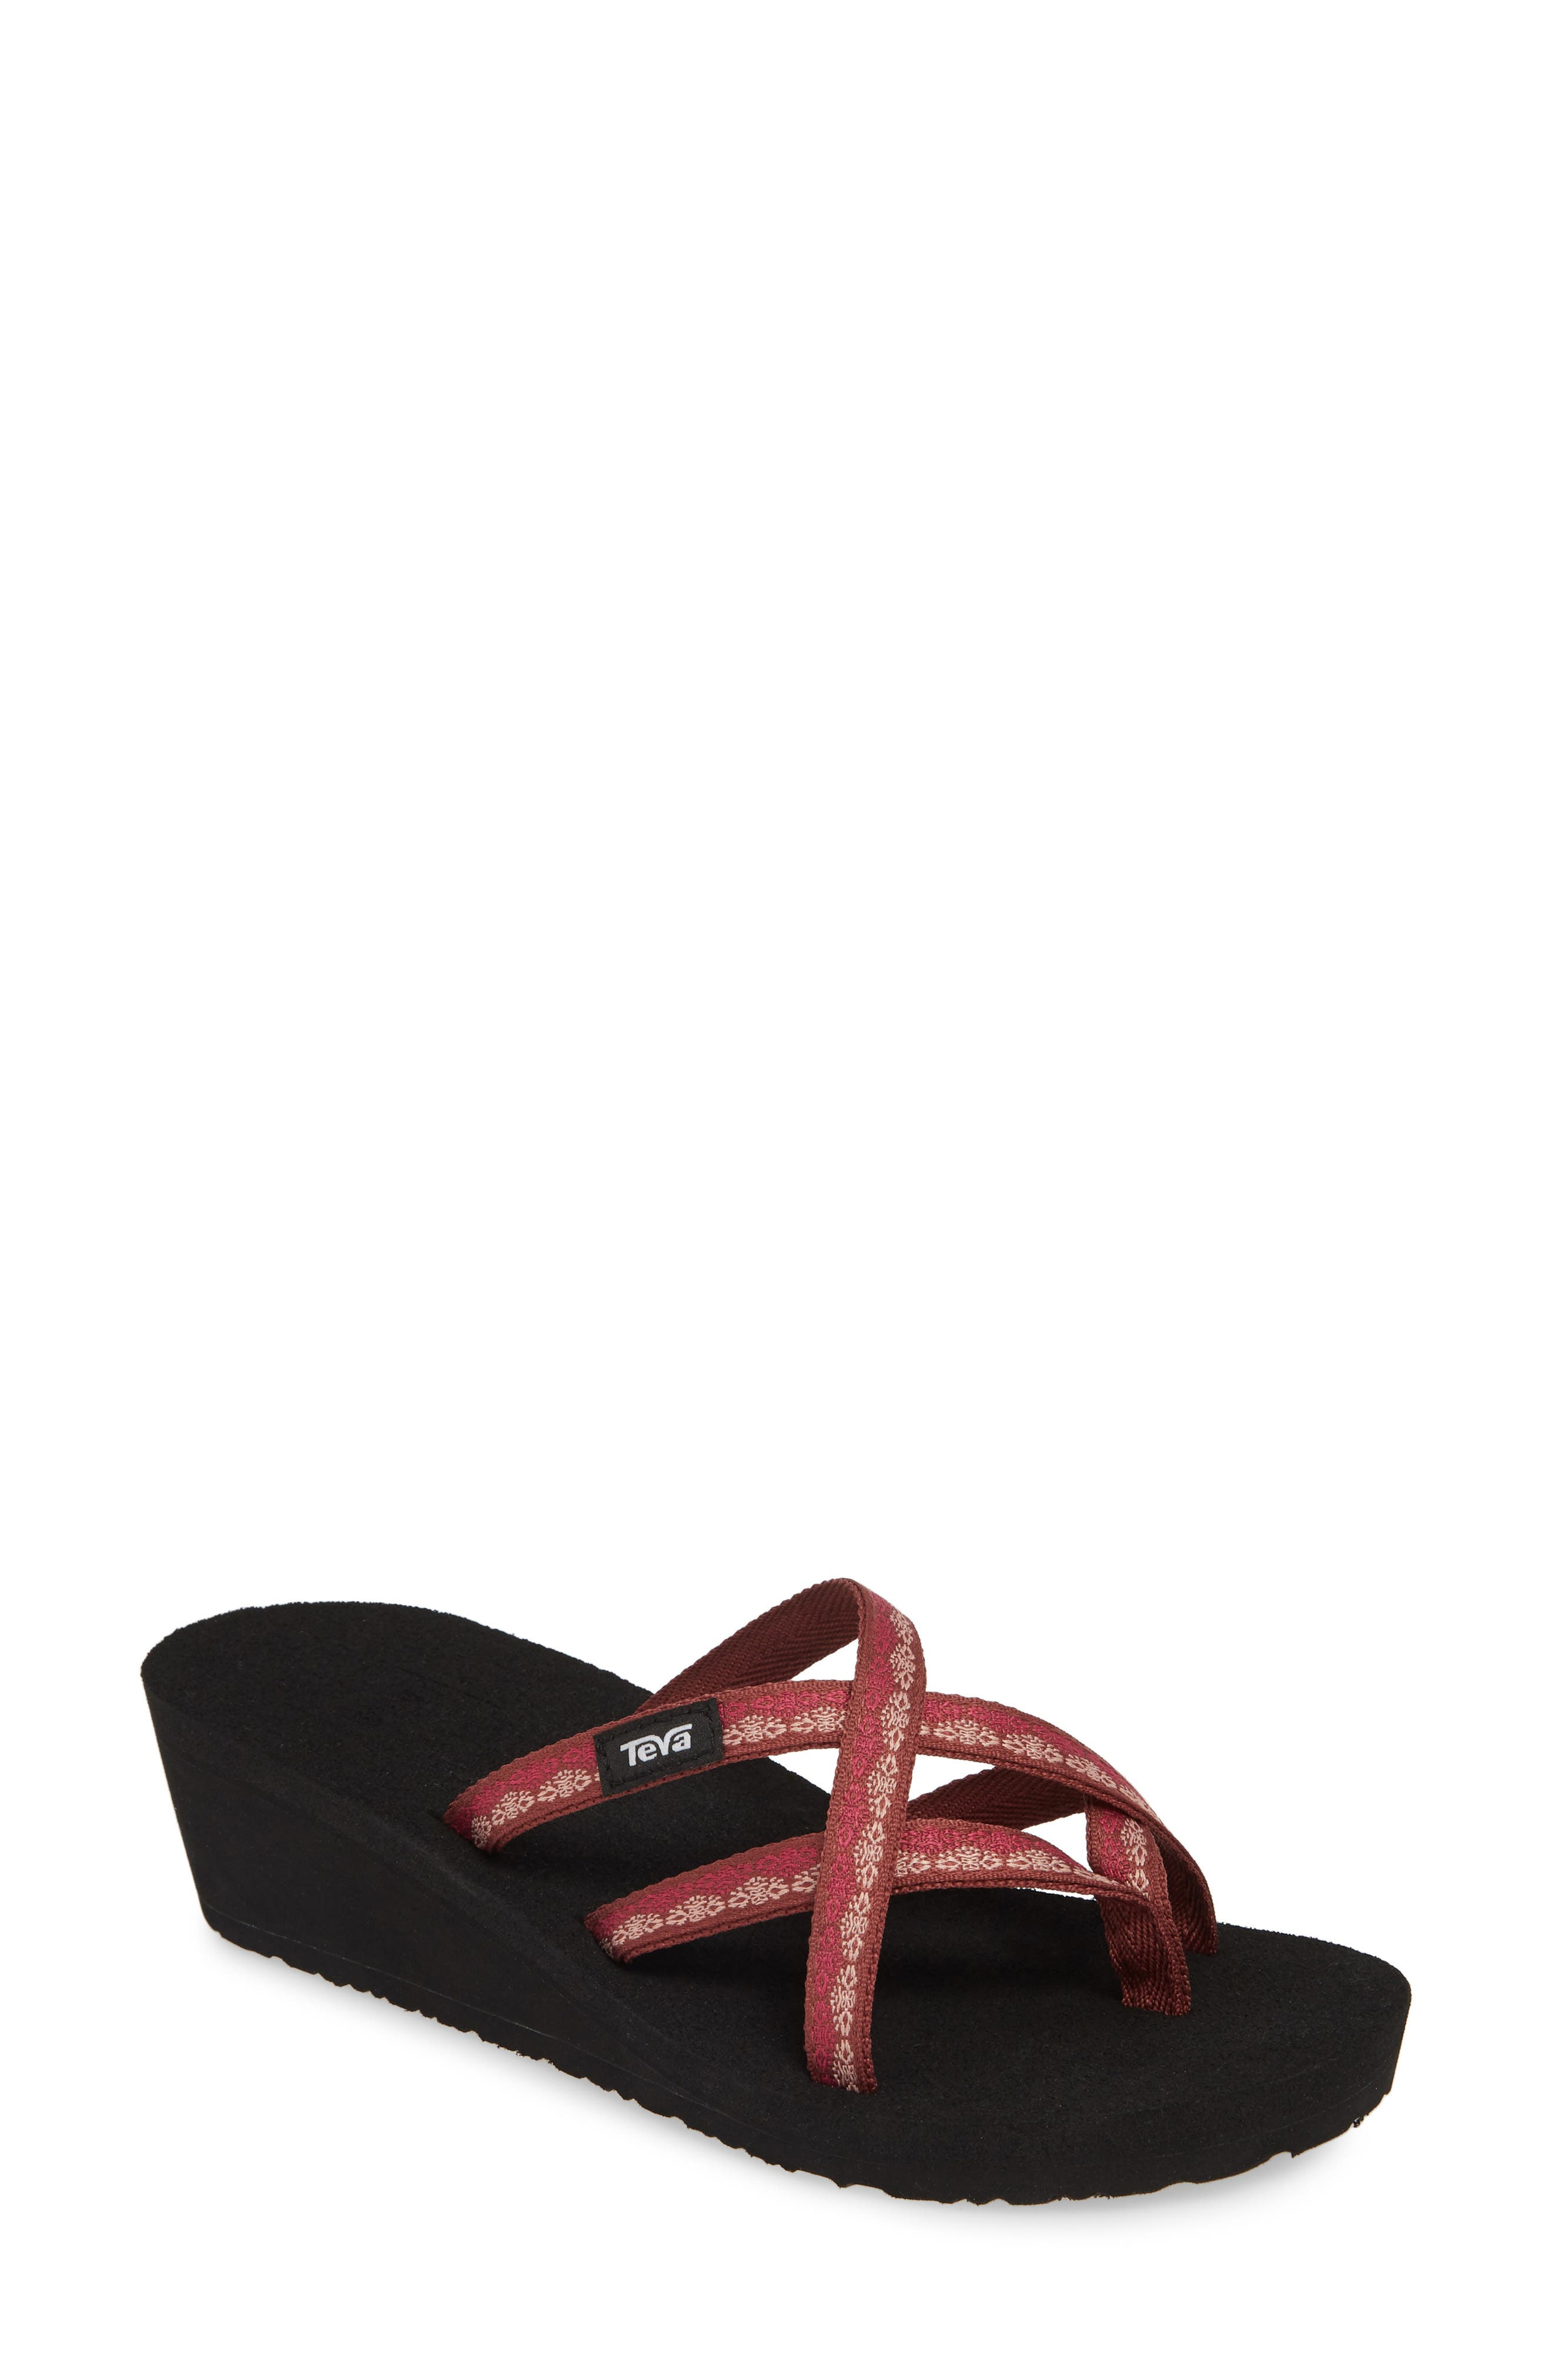 9f0a8a1ff Teva Sandals - Women s